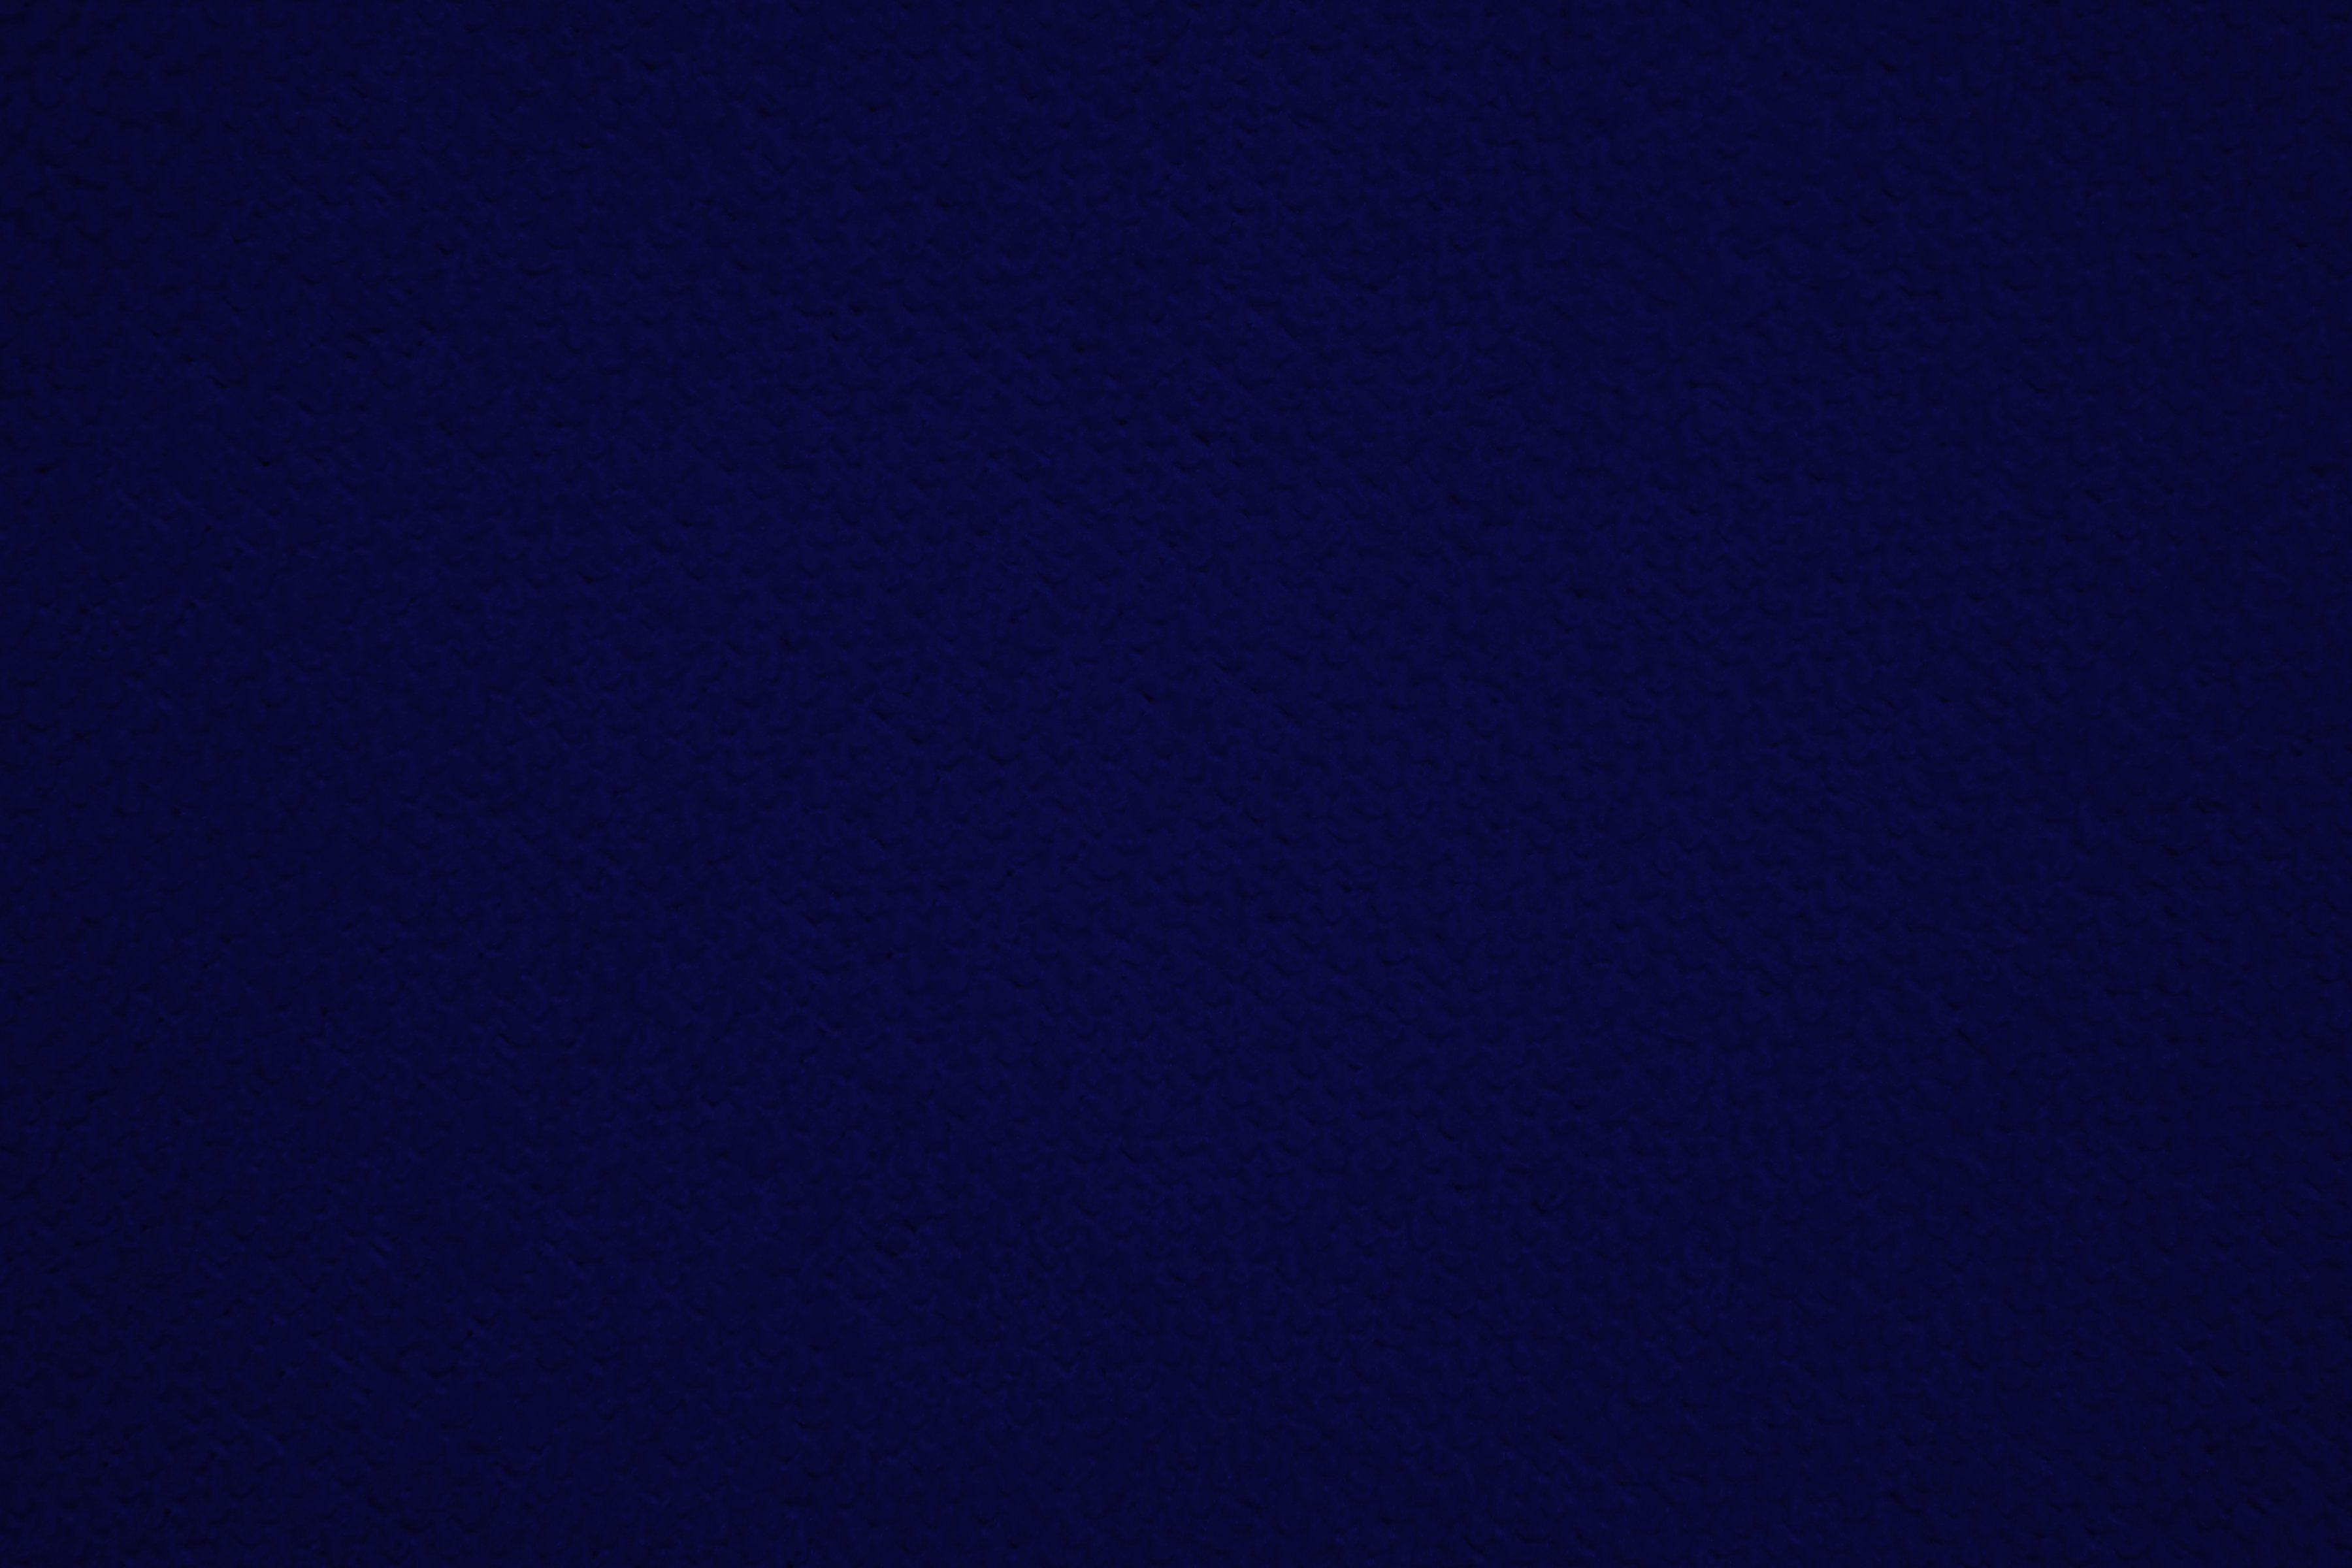 Dark Blue Backgrounds Image Wallpaper Cave Dark Blue Wallpaper Blue Wallpapers Wedding Titles